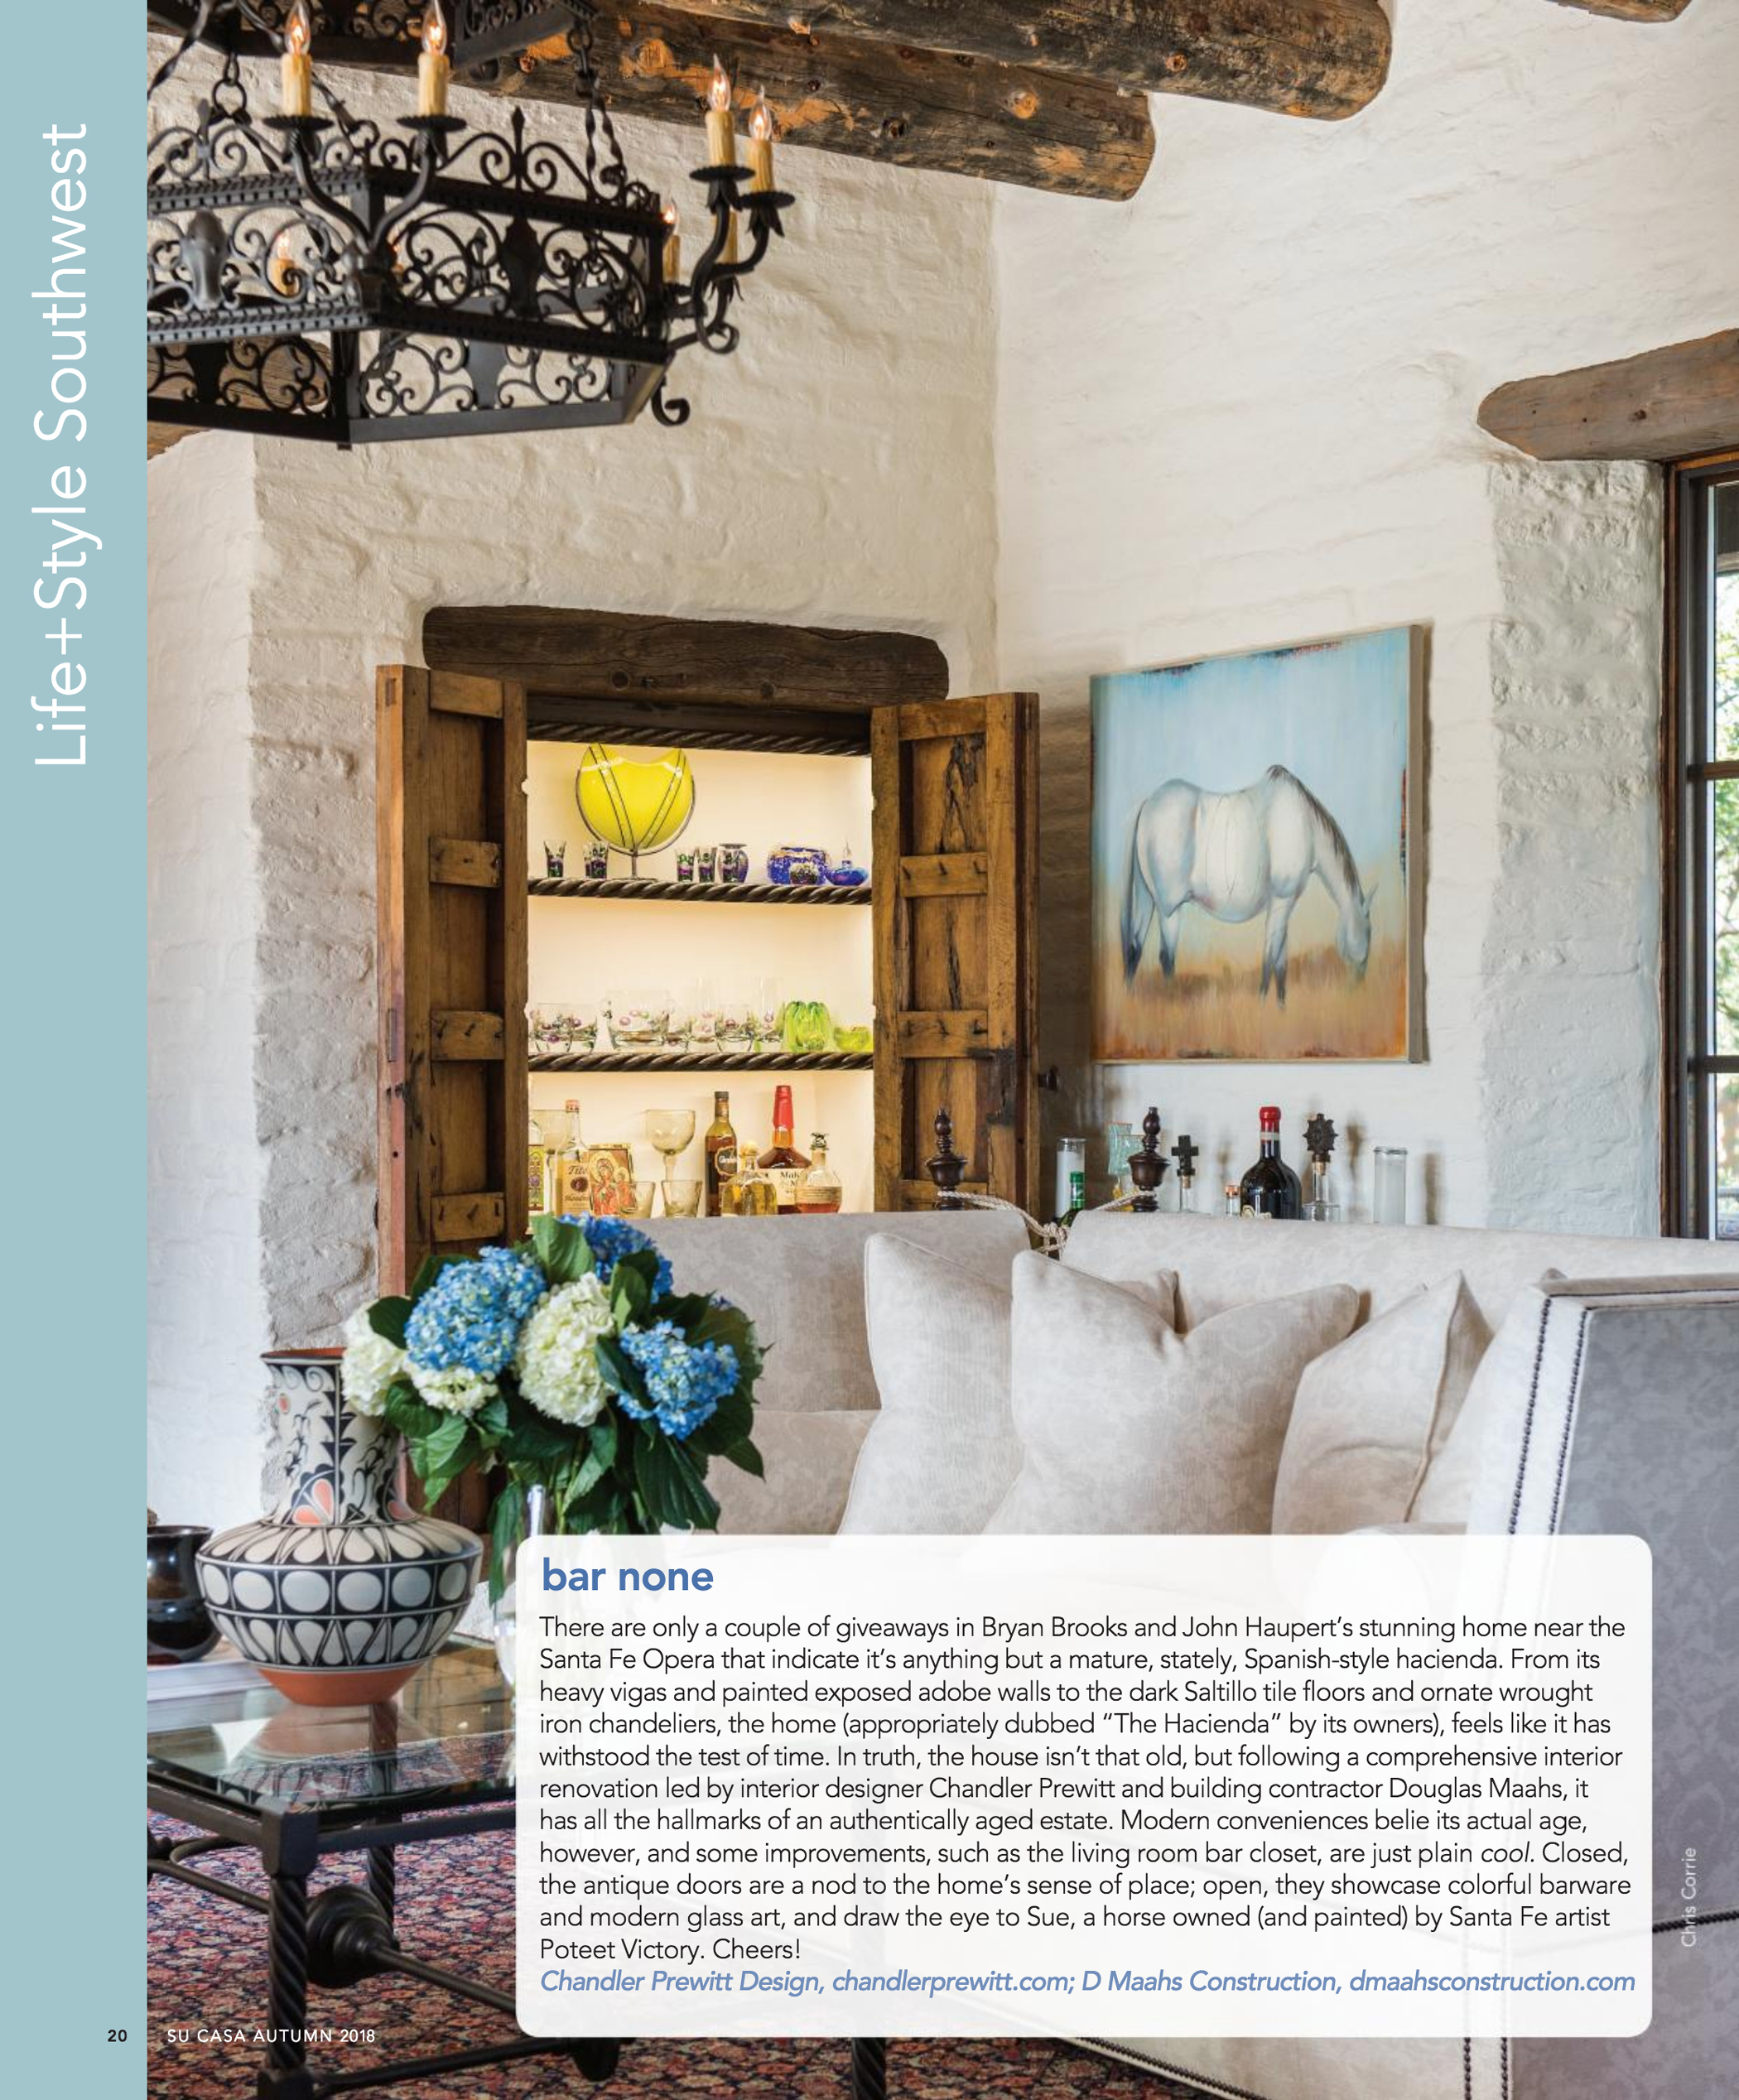 Chandler-Prewitt-Interiors-Su-Casa-Magazine-2018_article_sm.jpg